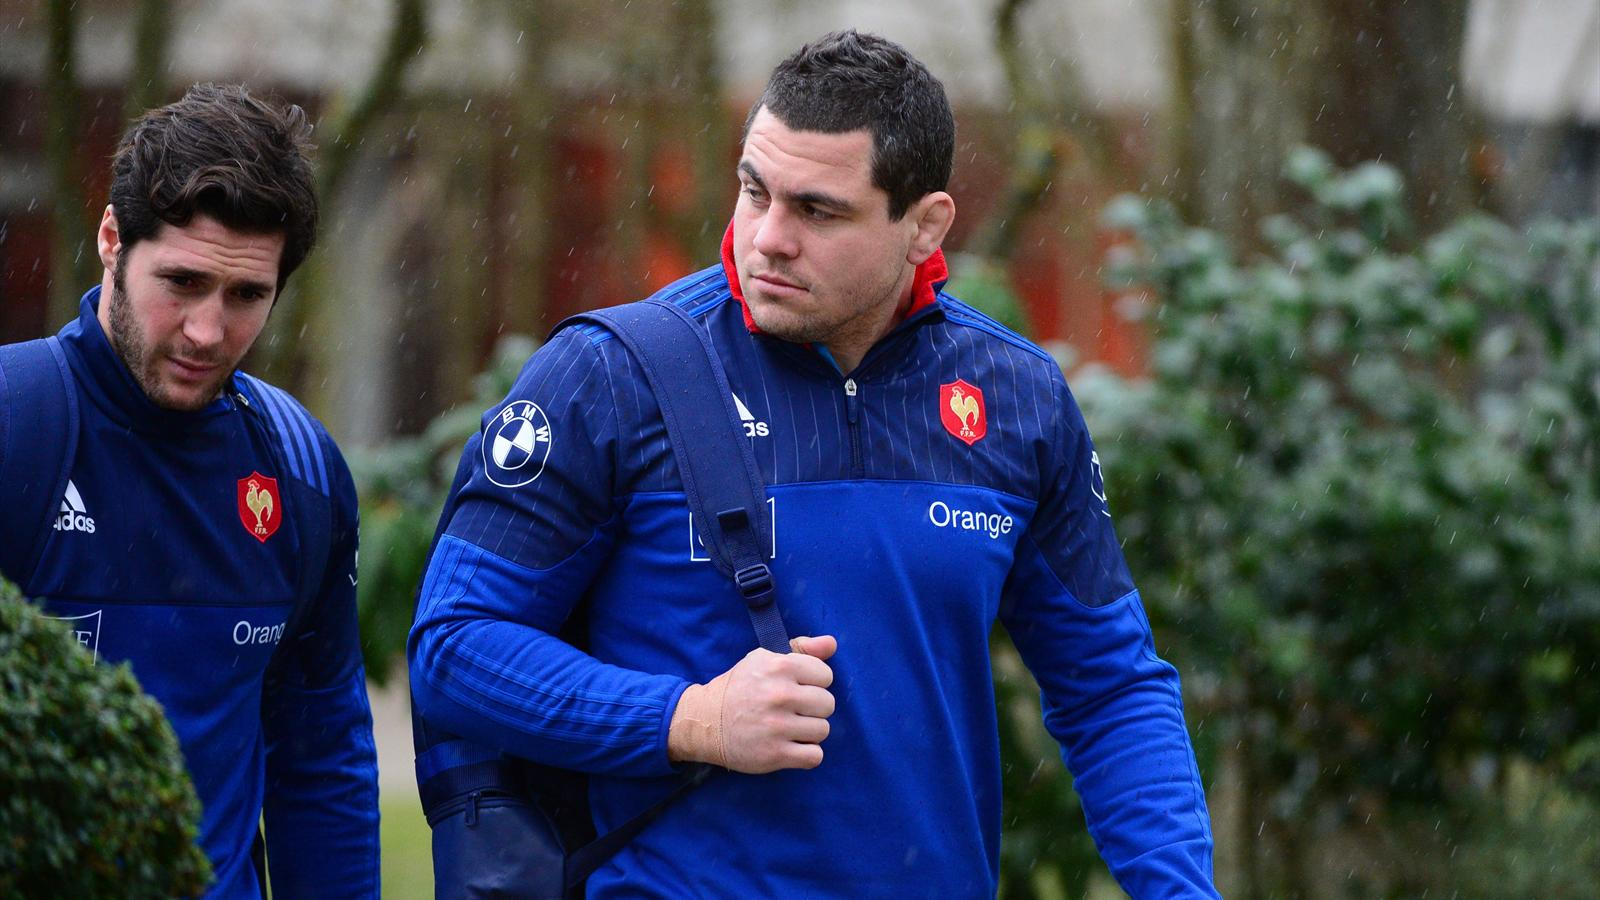 Guilhem Guirado et Maxime Machenaud (XV de France) - 2 février 2016